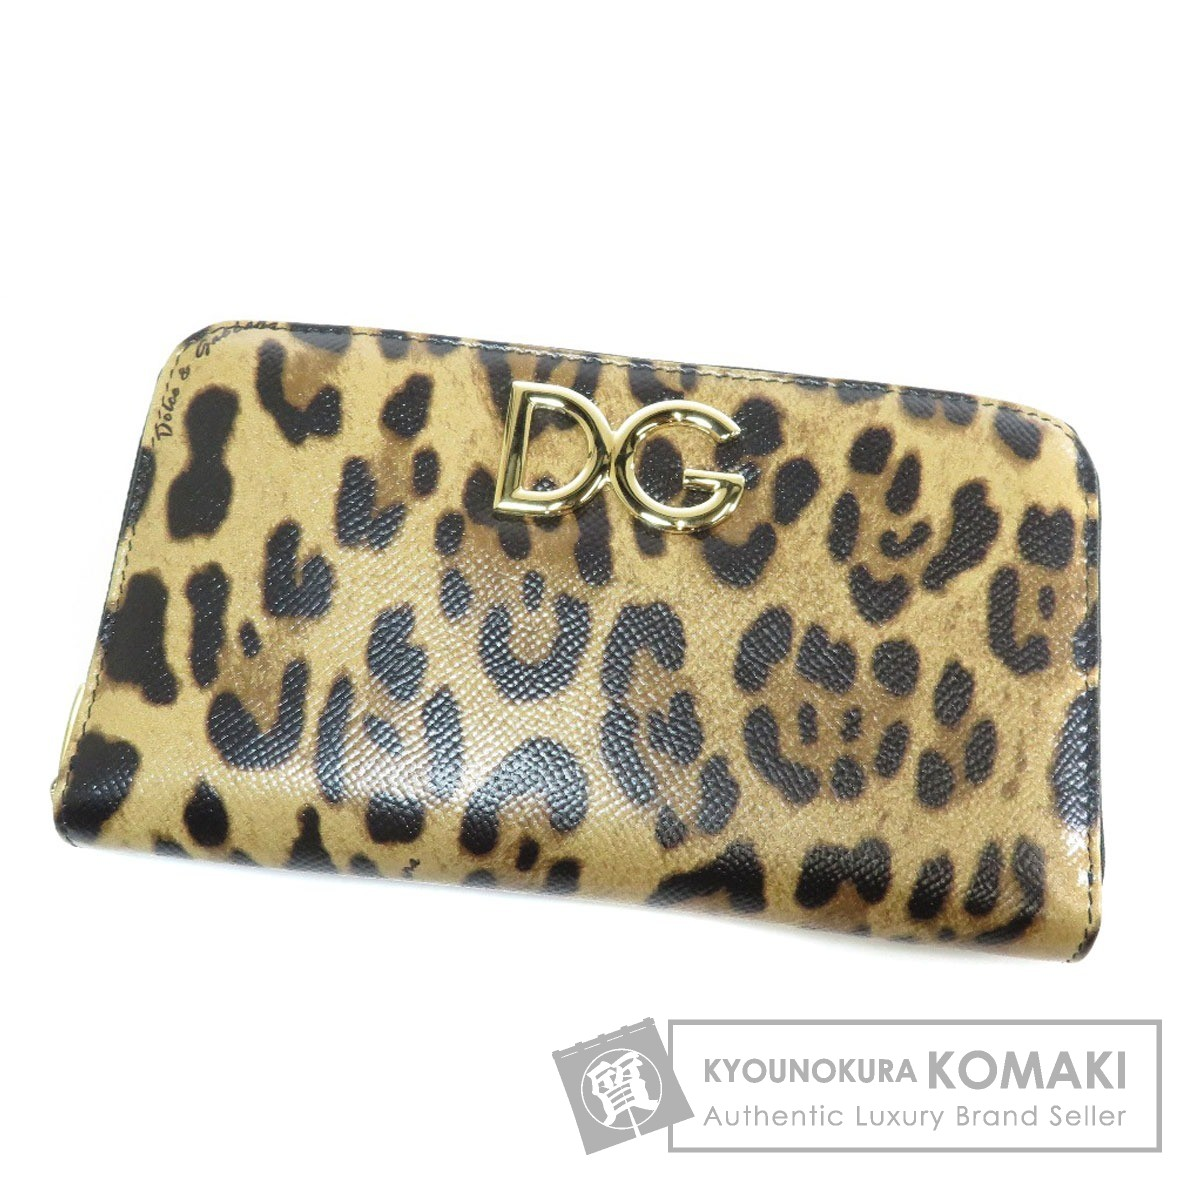 Dolce&Gabbana レオバード柄 長財布(小銭入れあり) PVC レディース 【中古】【ドルチェアンドガッバーナ】